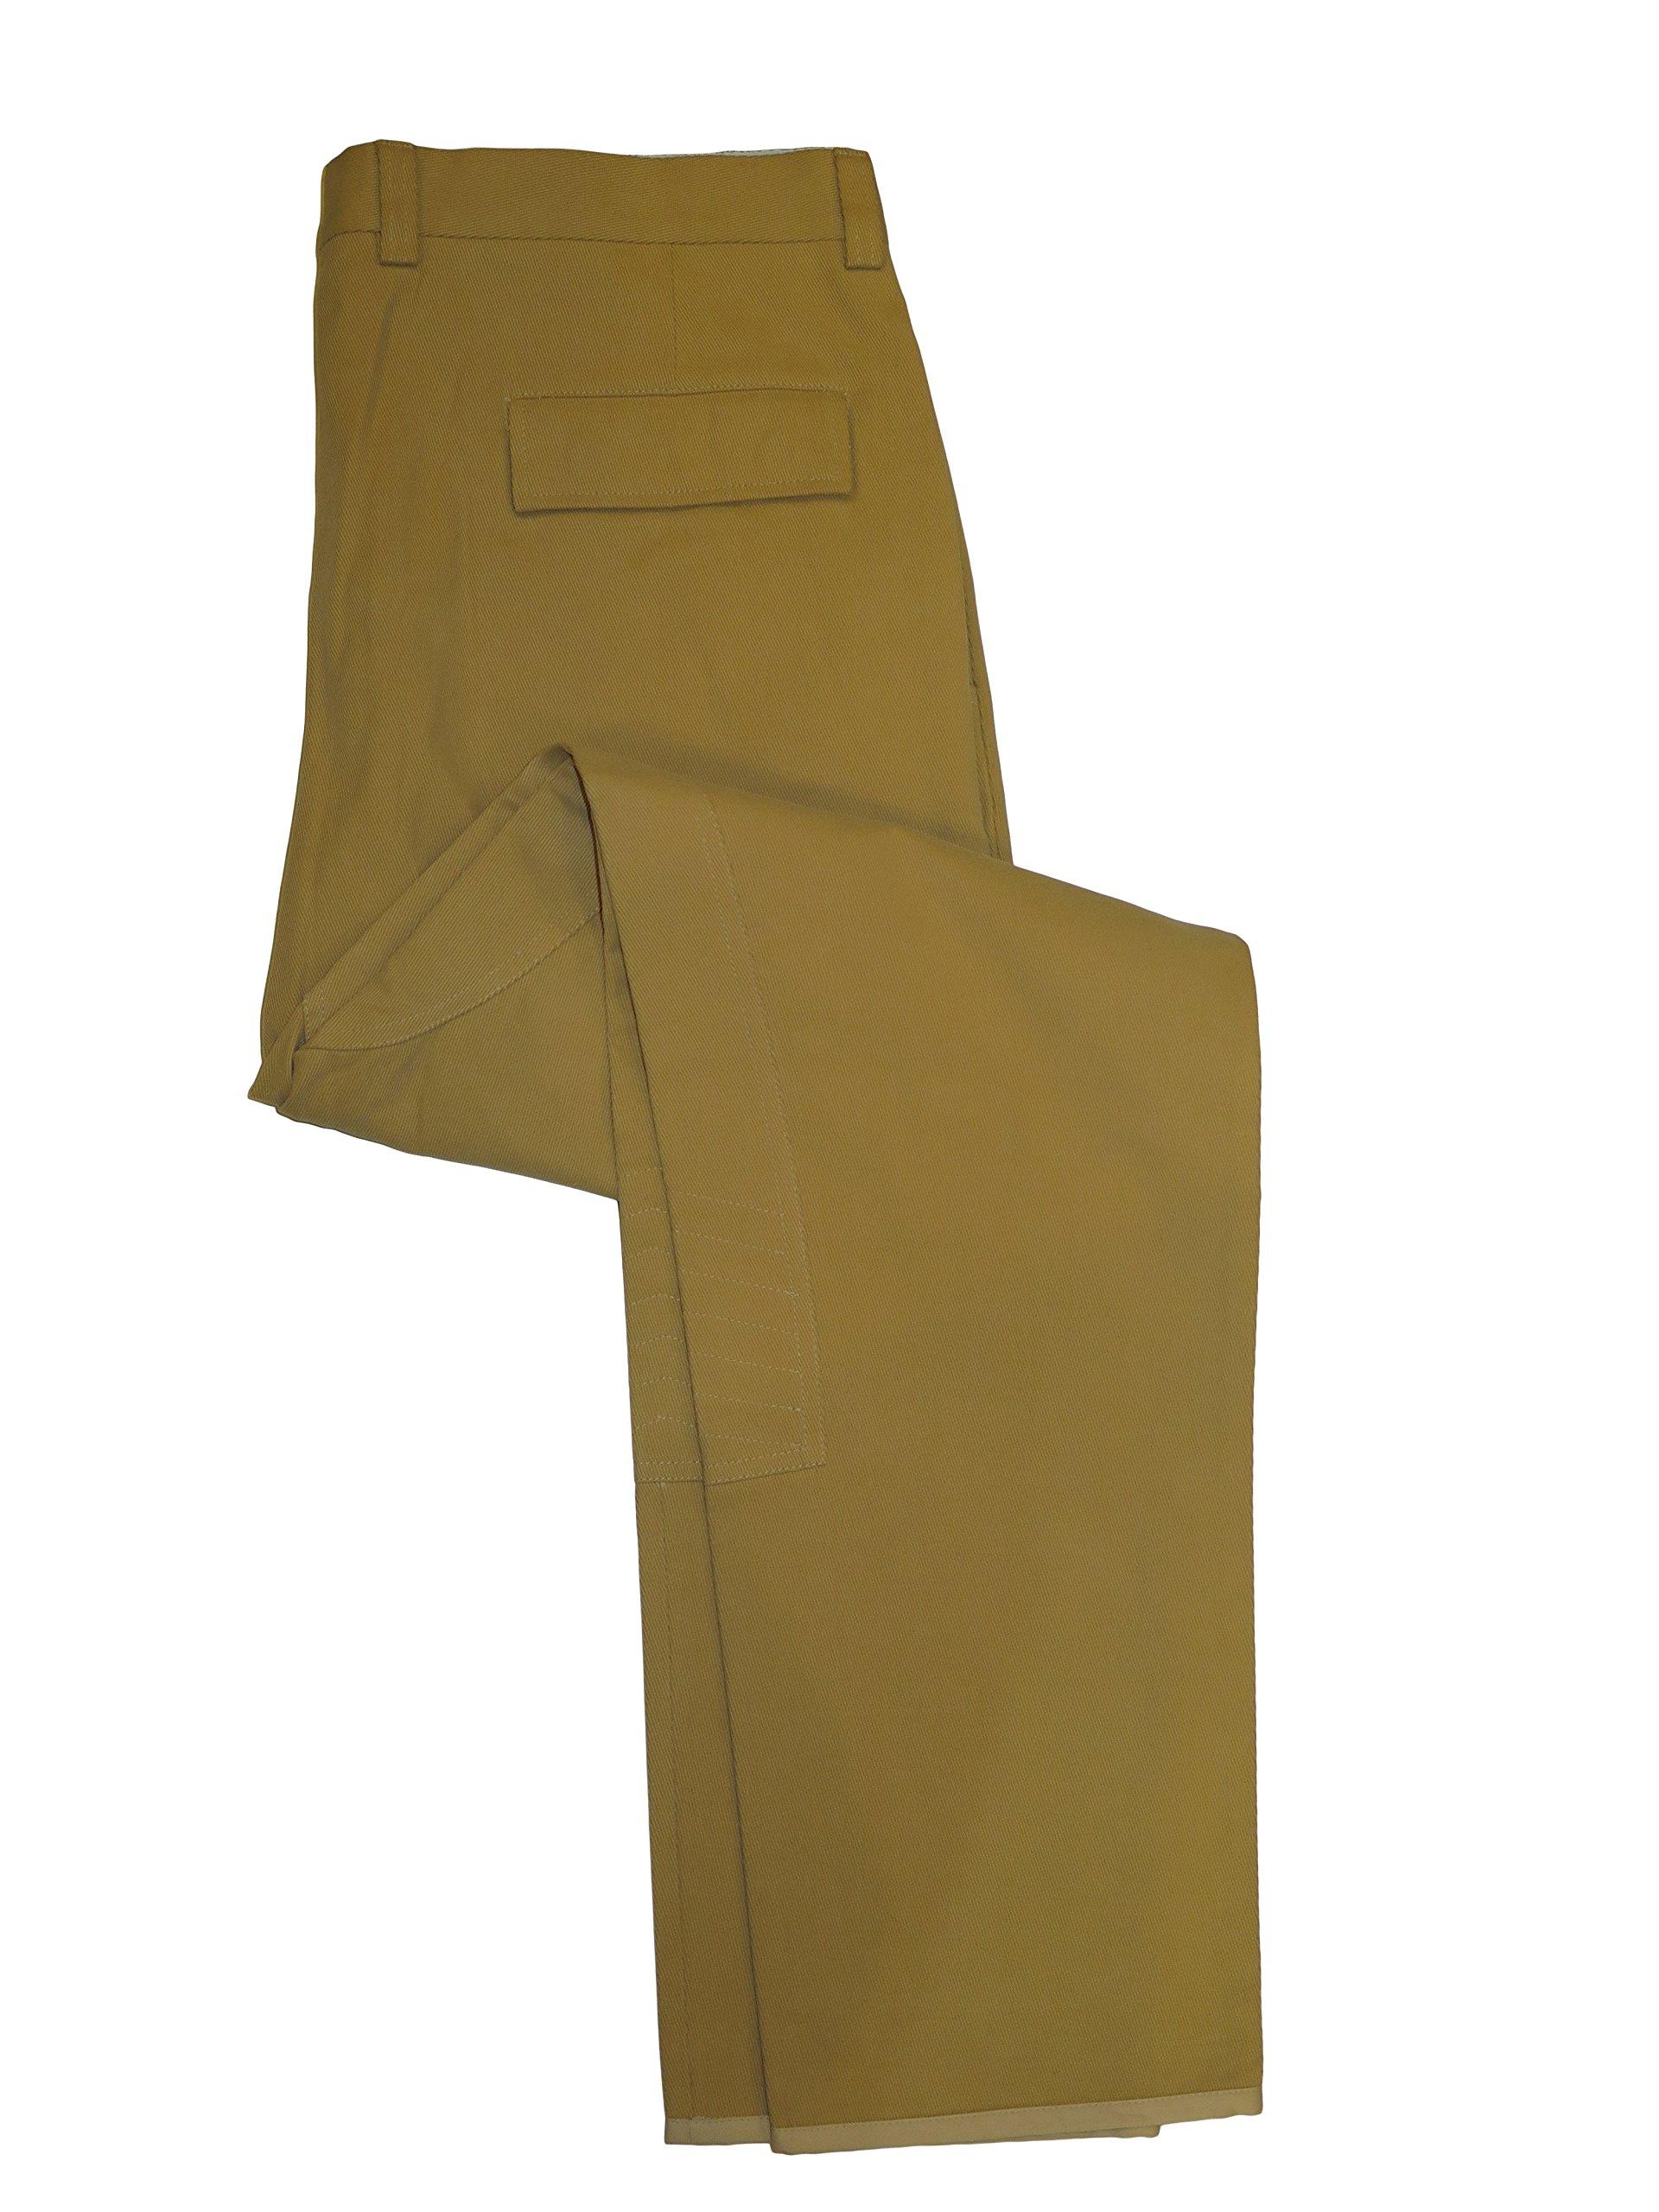 Brunello Cucinelli Men's Beige Cotton Cargo Pants 54 / 38